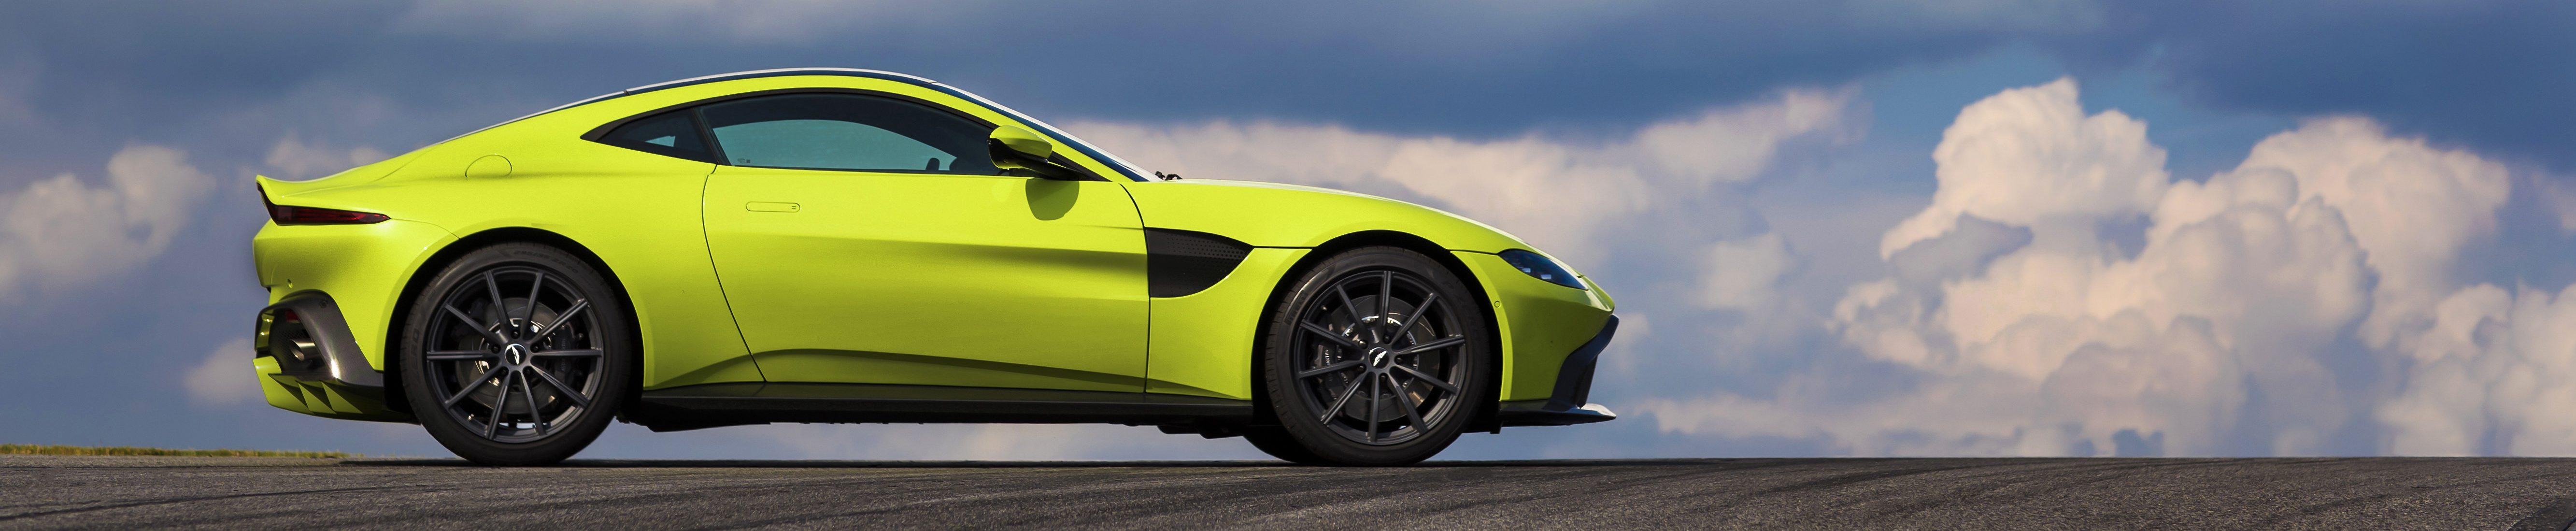 The New Aston Martin Vantage is a Rare Breed